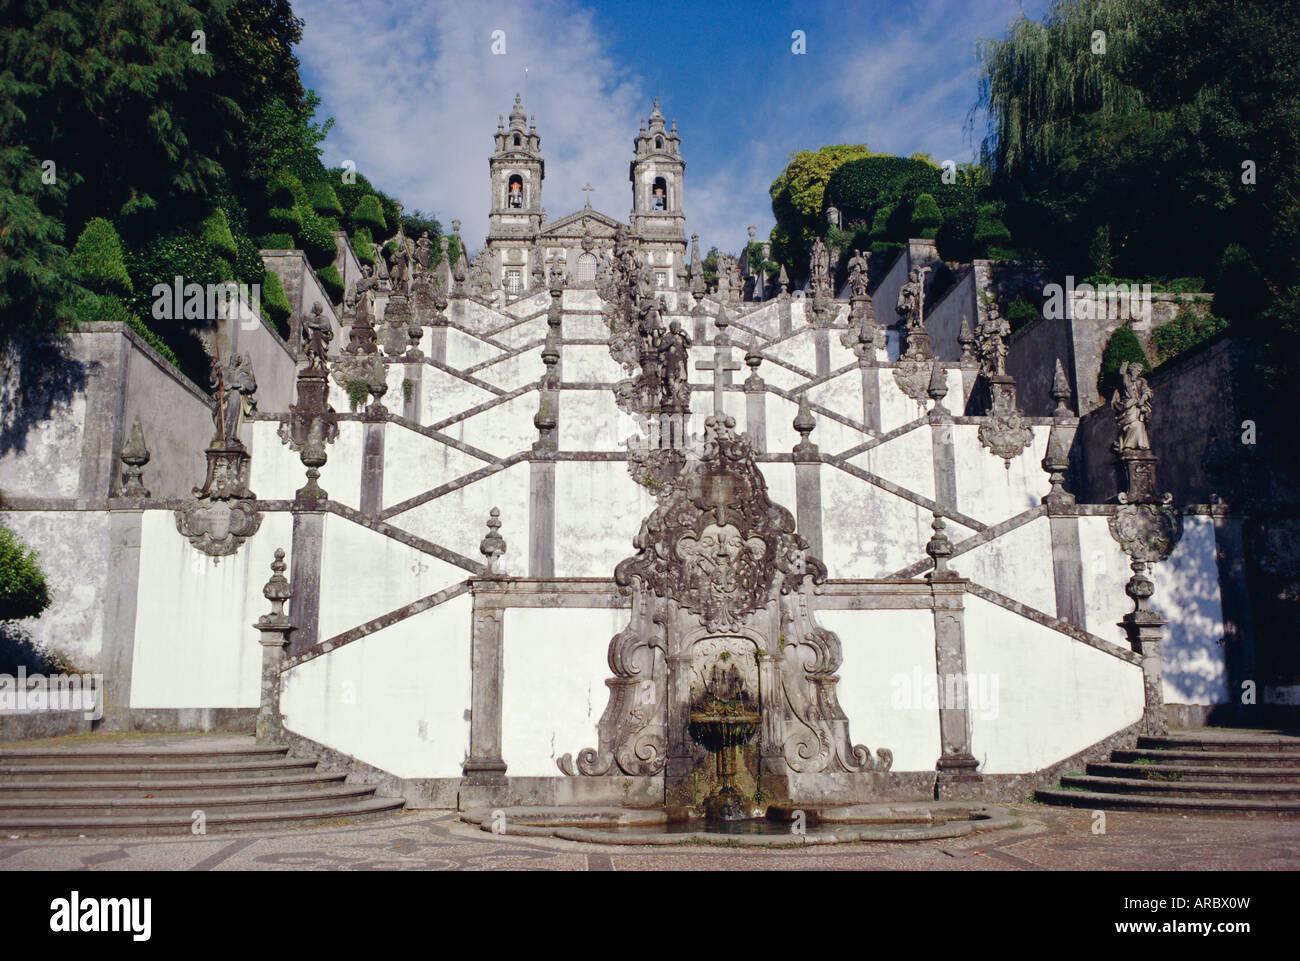 Santuary staircase 1723, from halfway point, Bom Jesus do Monte, Braga, Minho, Portugal, Europe - Stock Image